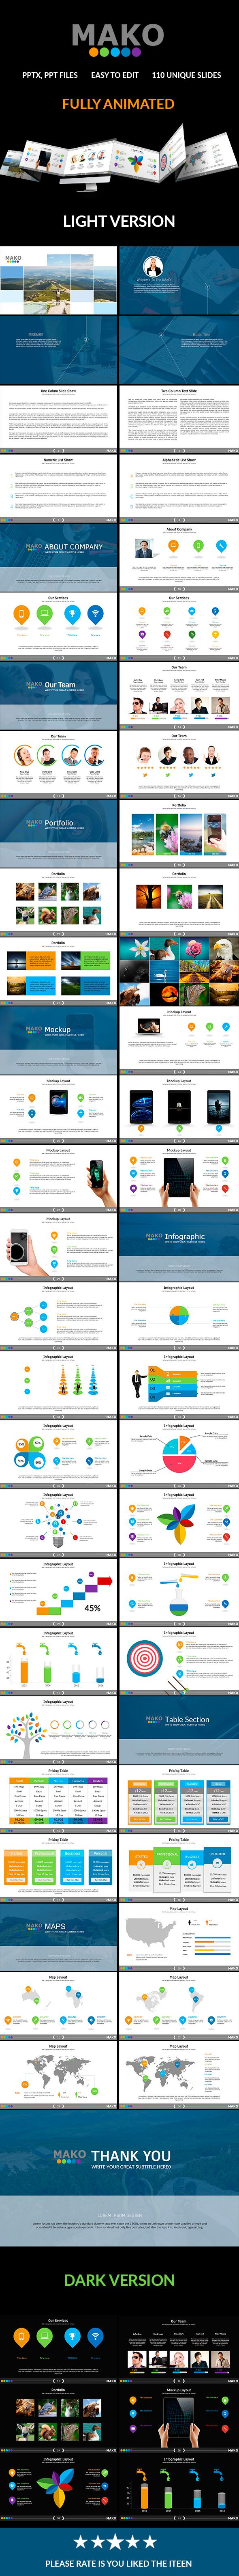 Mako Powerpoint Presentation (PowerPoint Templates)